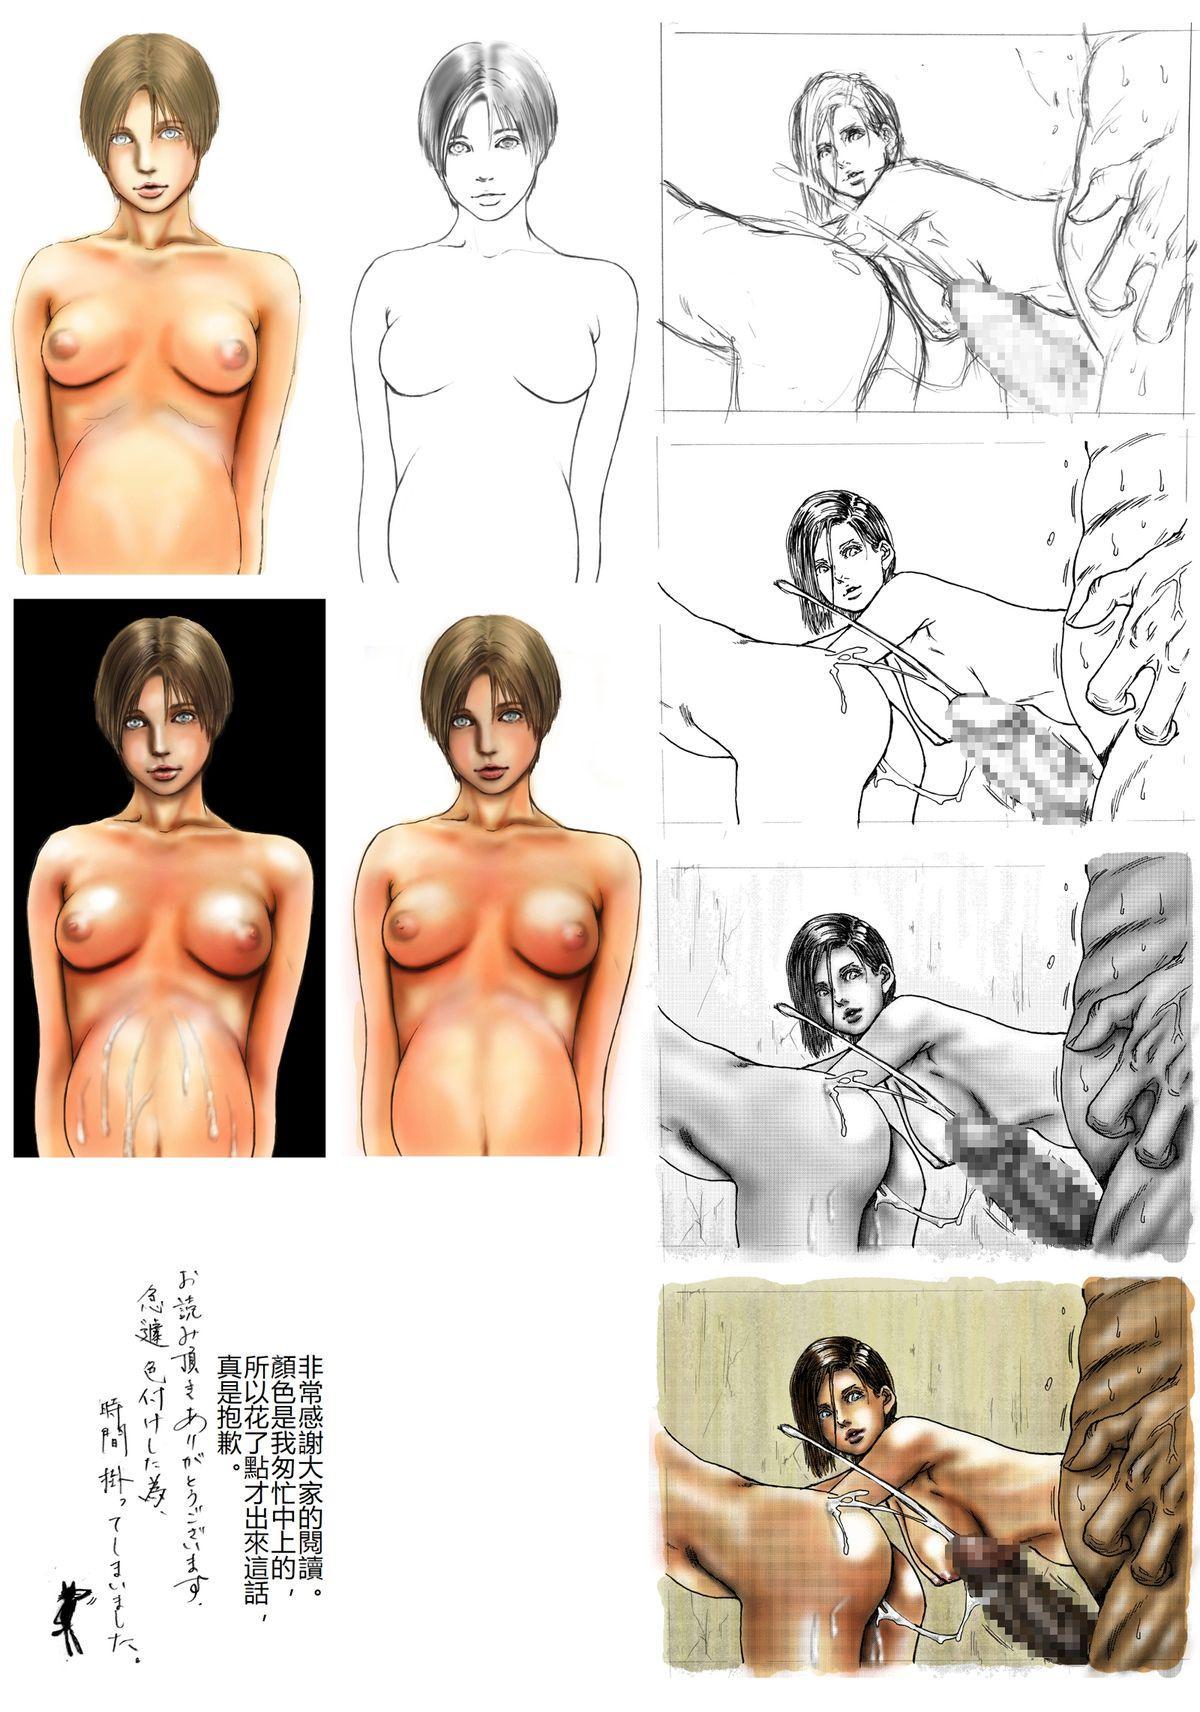 BODY HAZARD 5 Shushou Hen 53